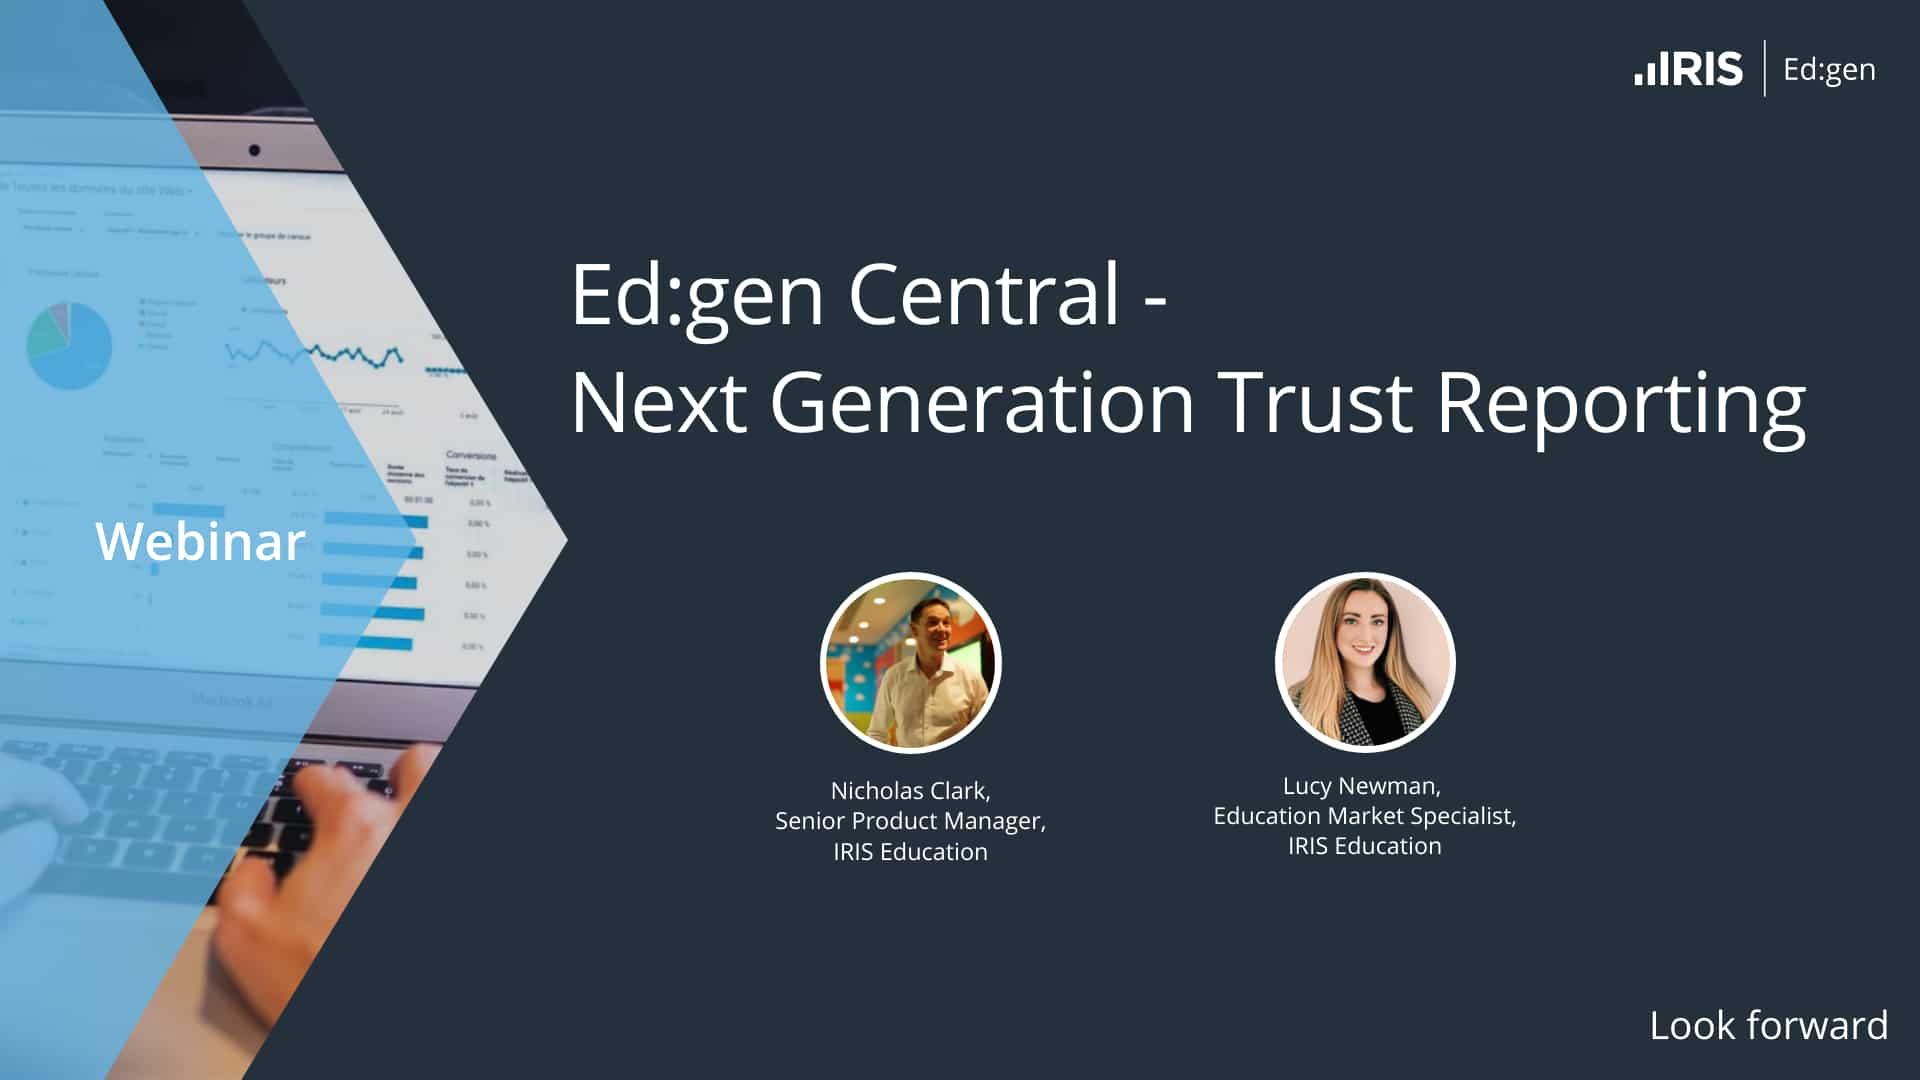 Edgen-Central-Next-Generation-Trust-Reporting-Holding-Screen-26.08.21-Max-Quality.jpg